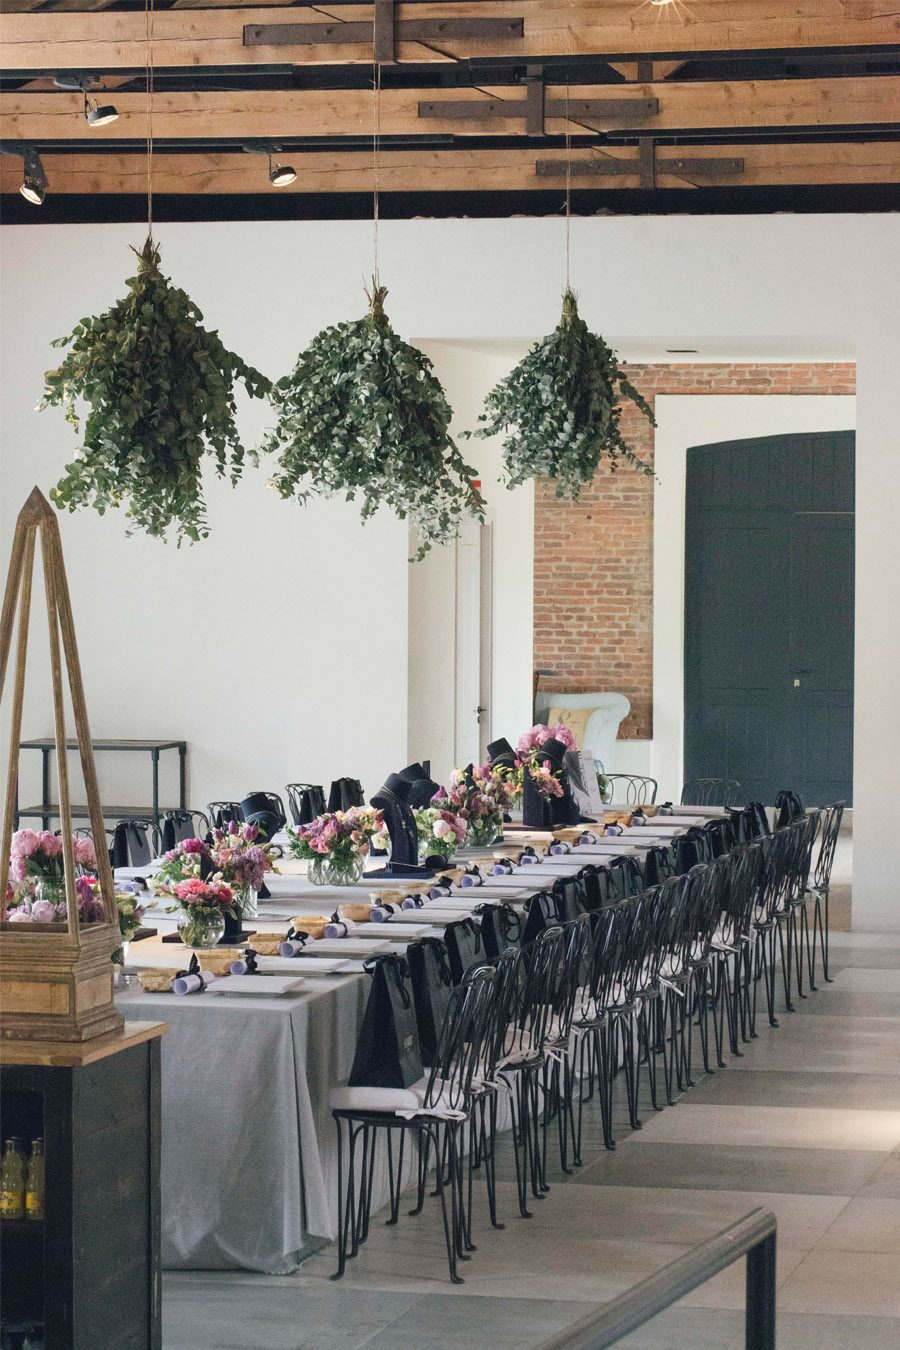 COLECCIÓN COMPROMISO 2016 DE JOYERÍA SUÁREZ suarez-joyas-boda